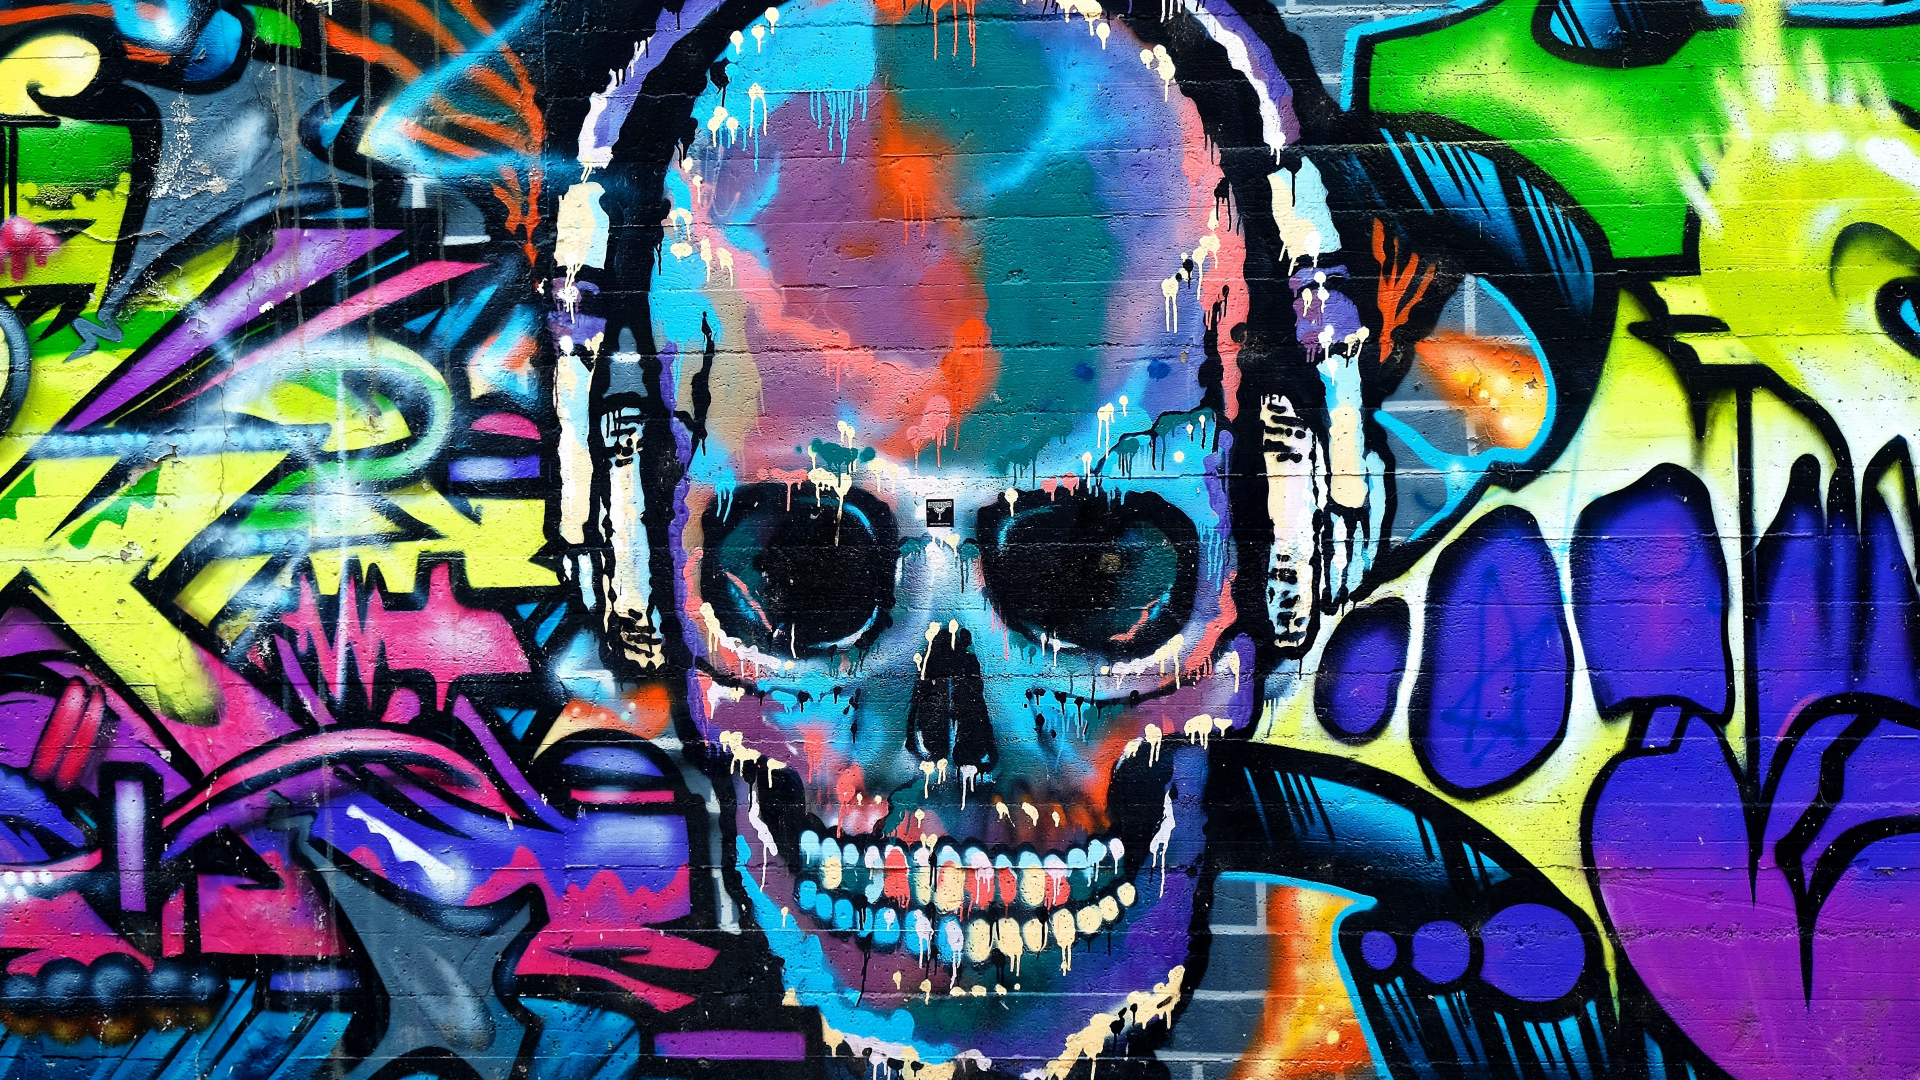 Graffiti skull colorful street art 1920x1080 wallpaper